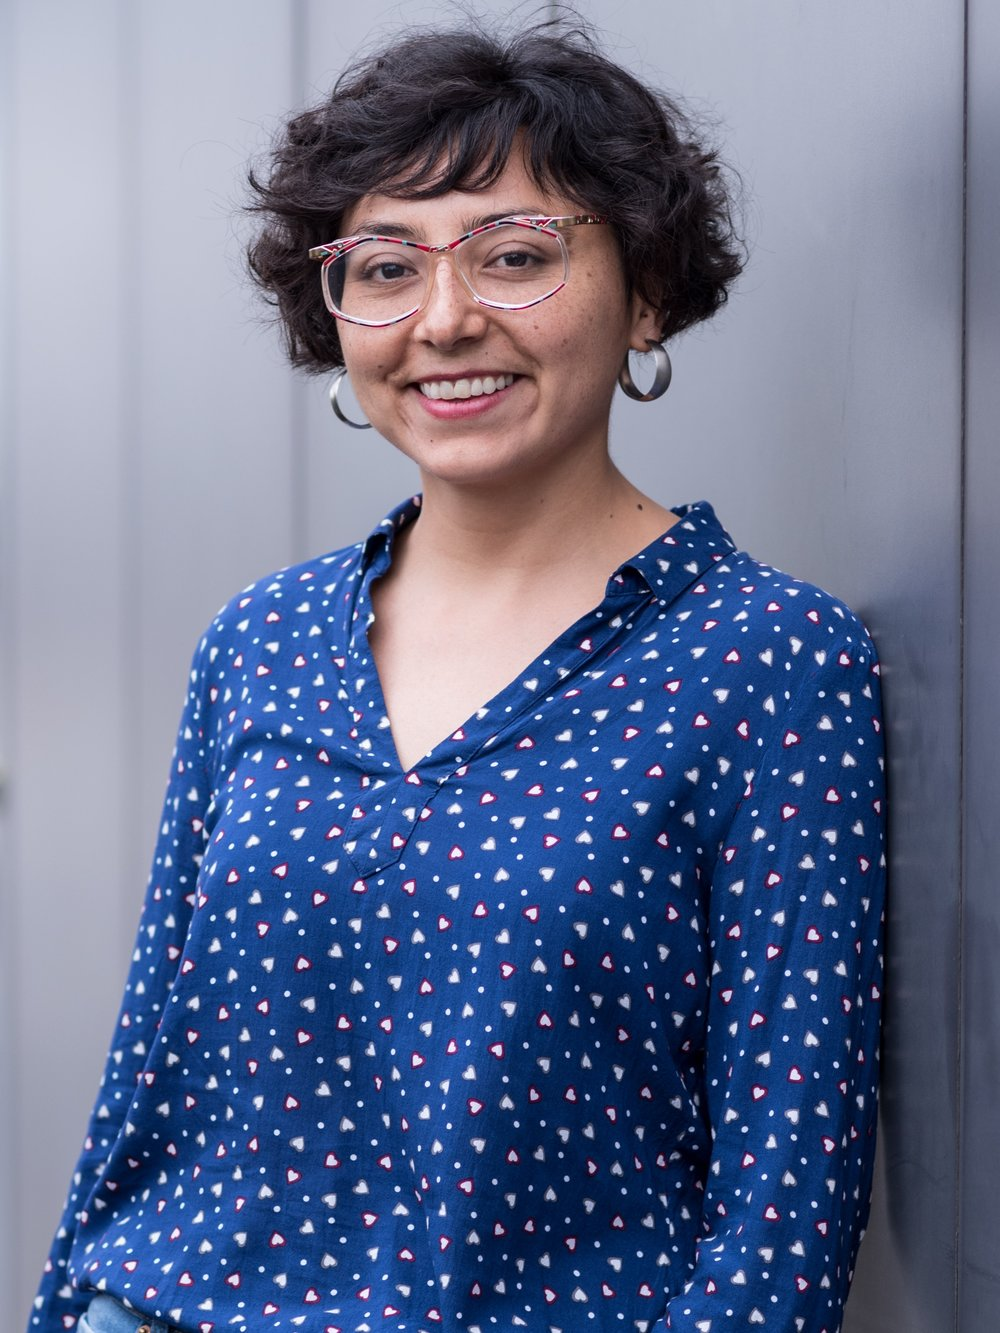 Anita Peña Saavedra - Nationality: ChileanLiving in: Santiago, ChileTwitter: @anpenasaavedra